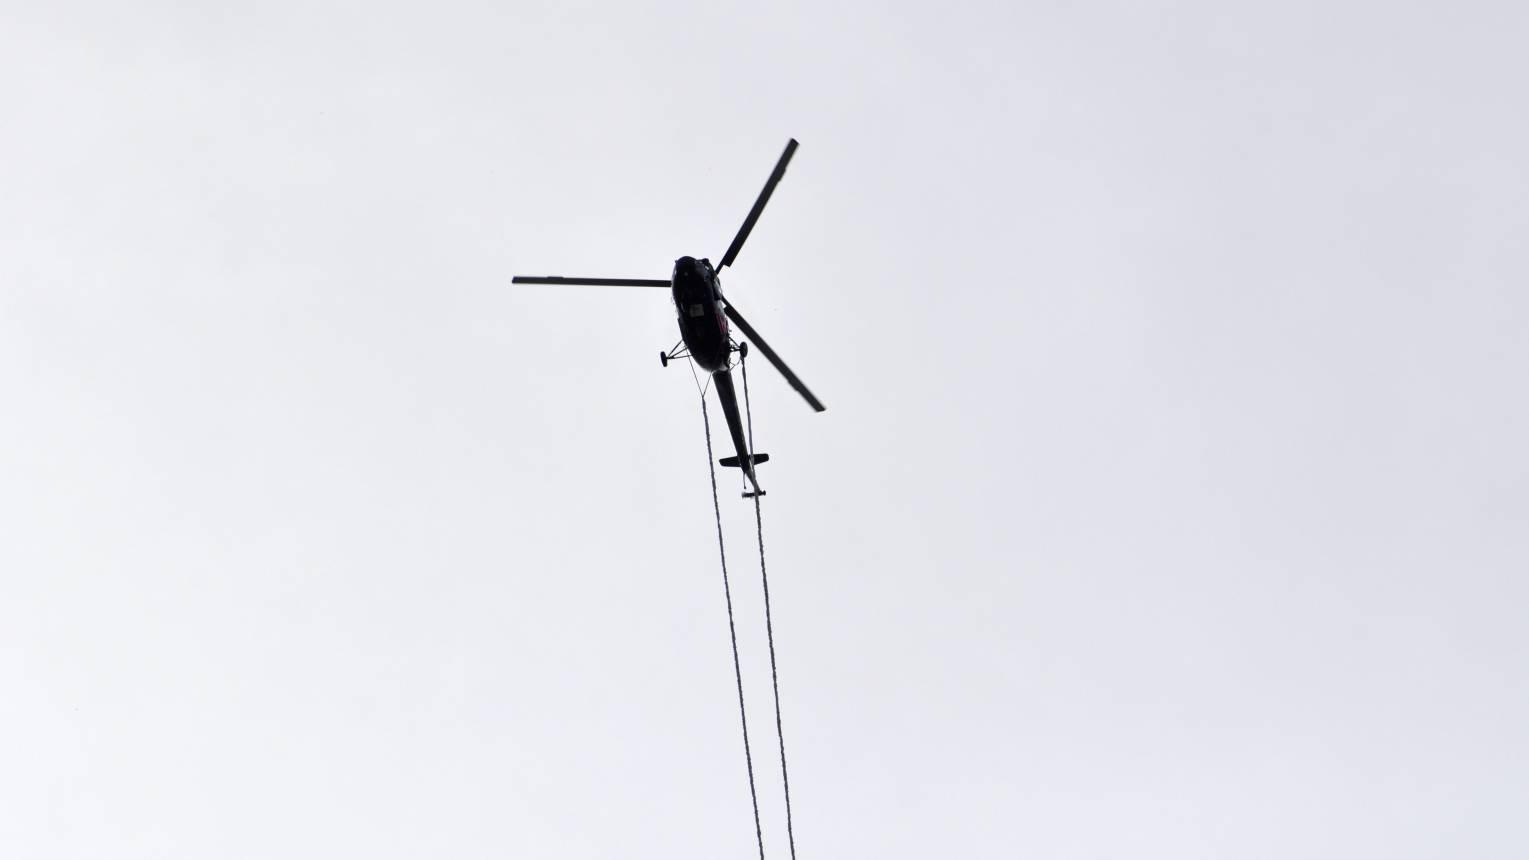 Bungee Jumping 600 méterről Helikopterből